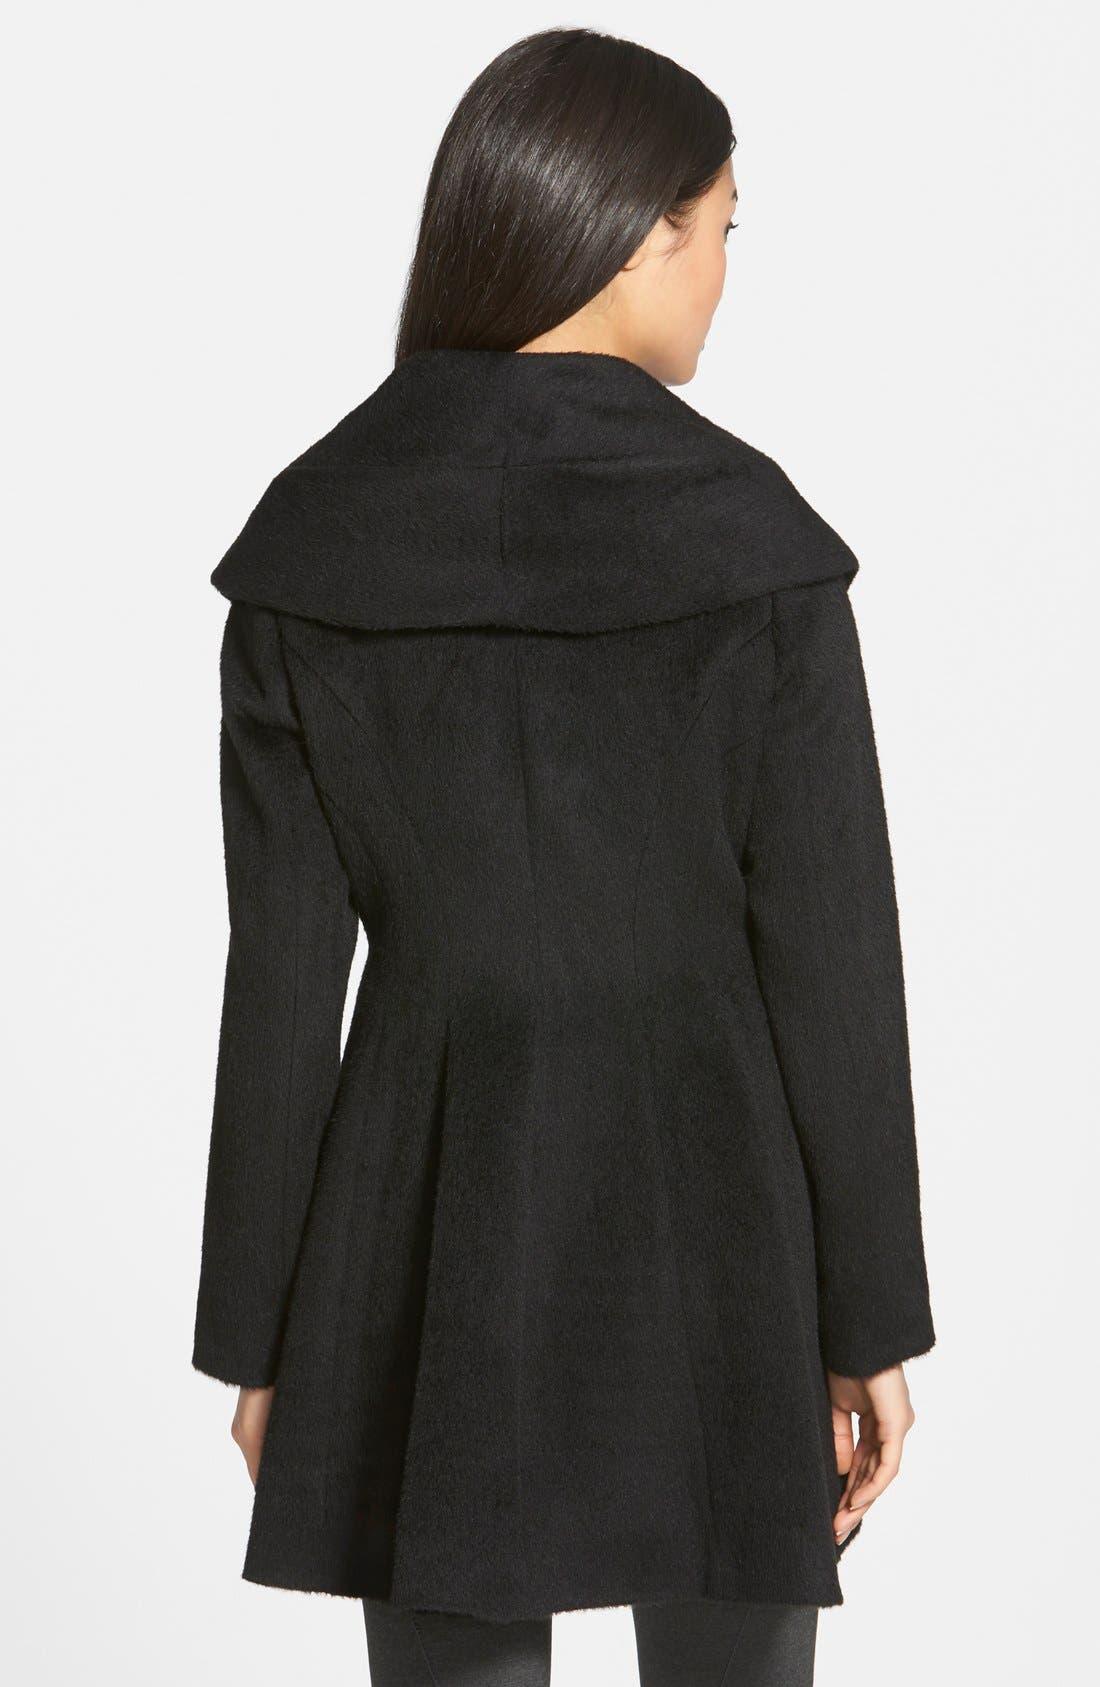 TRINA TURK,                             'Bonnie' Shawl Collar Skirted Coat,                             Alternate thumbnail 2, color,                             001